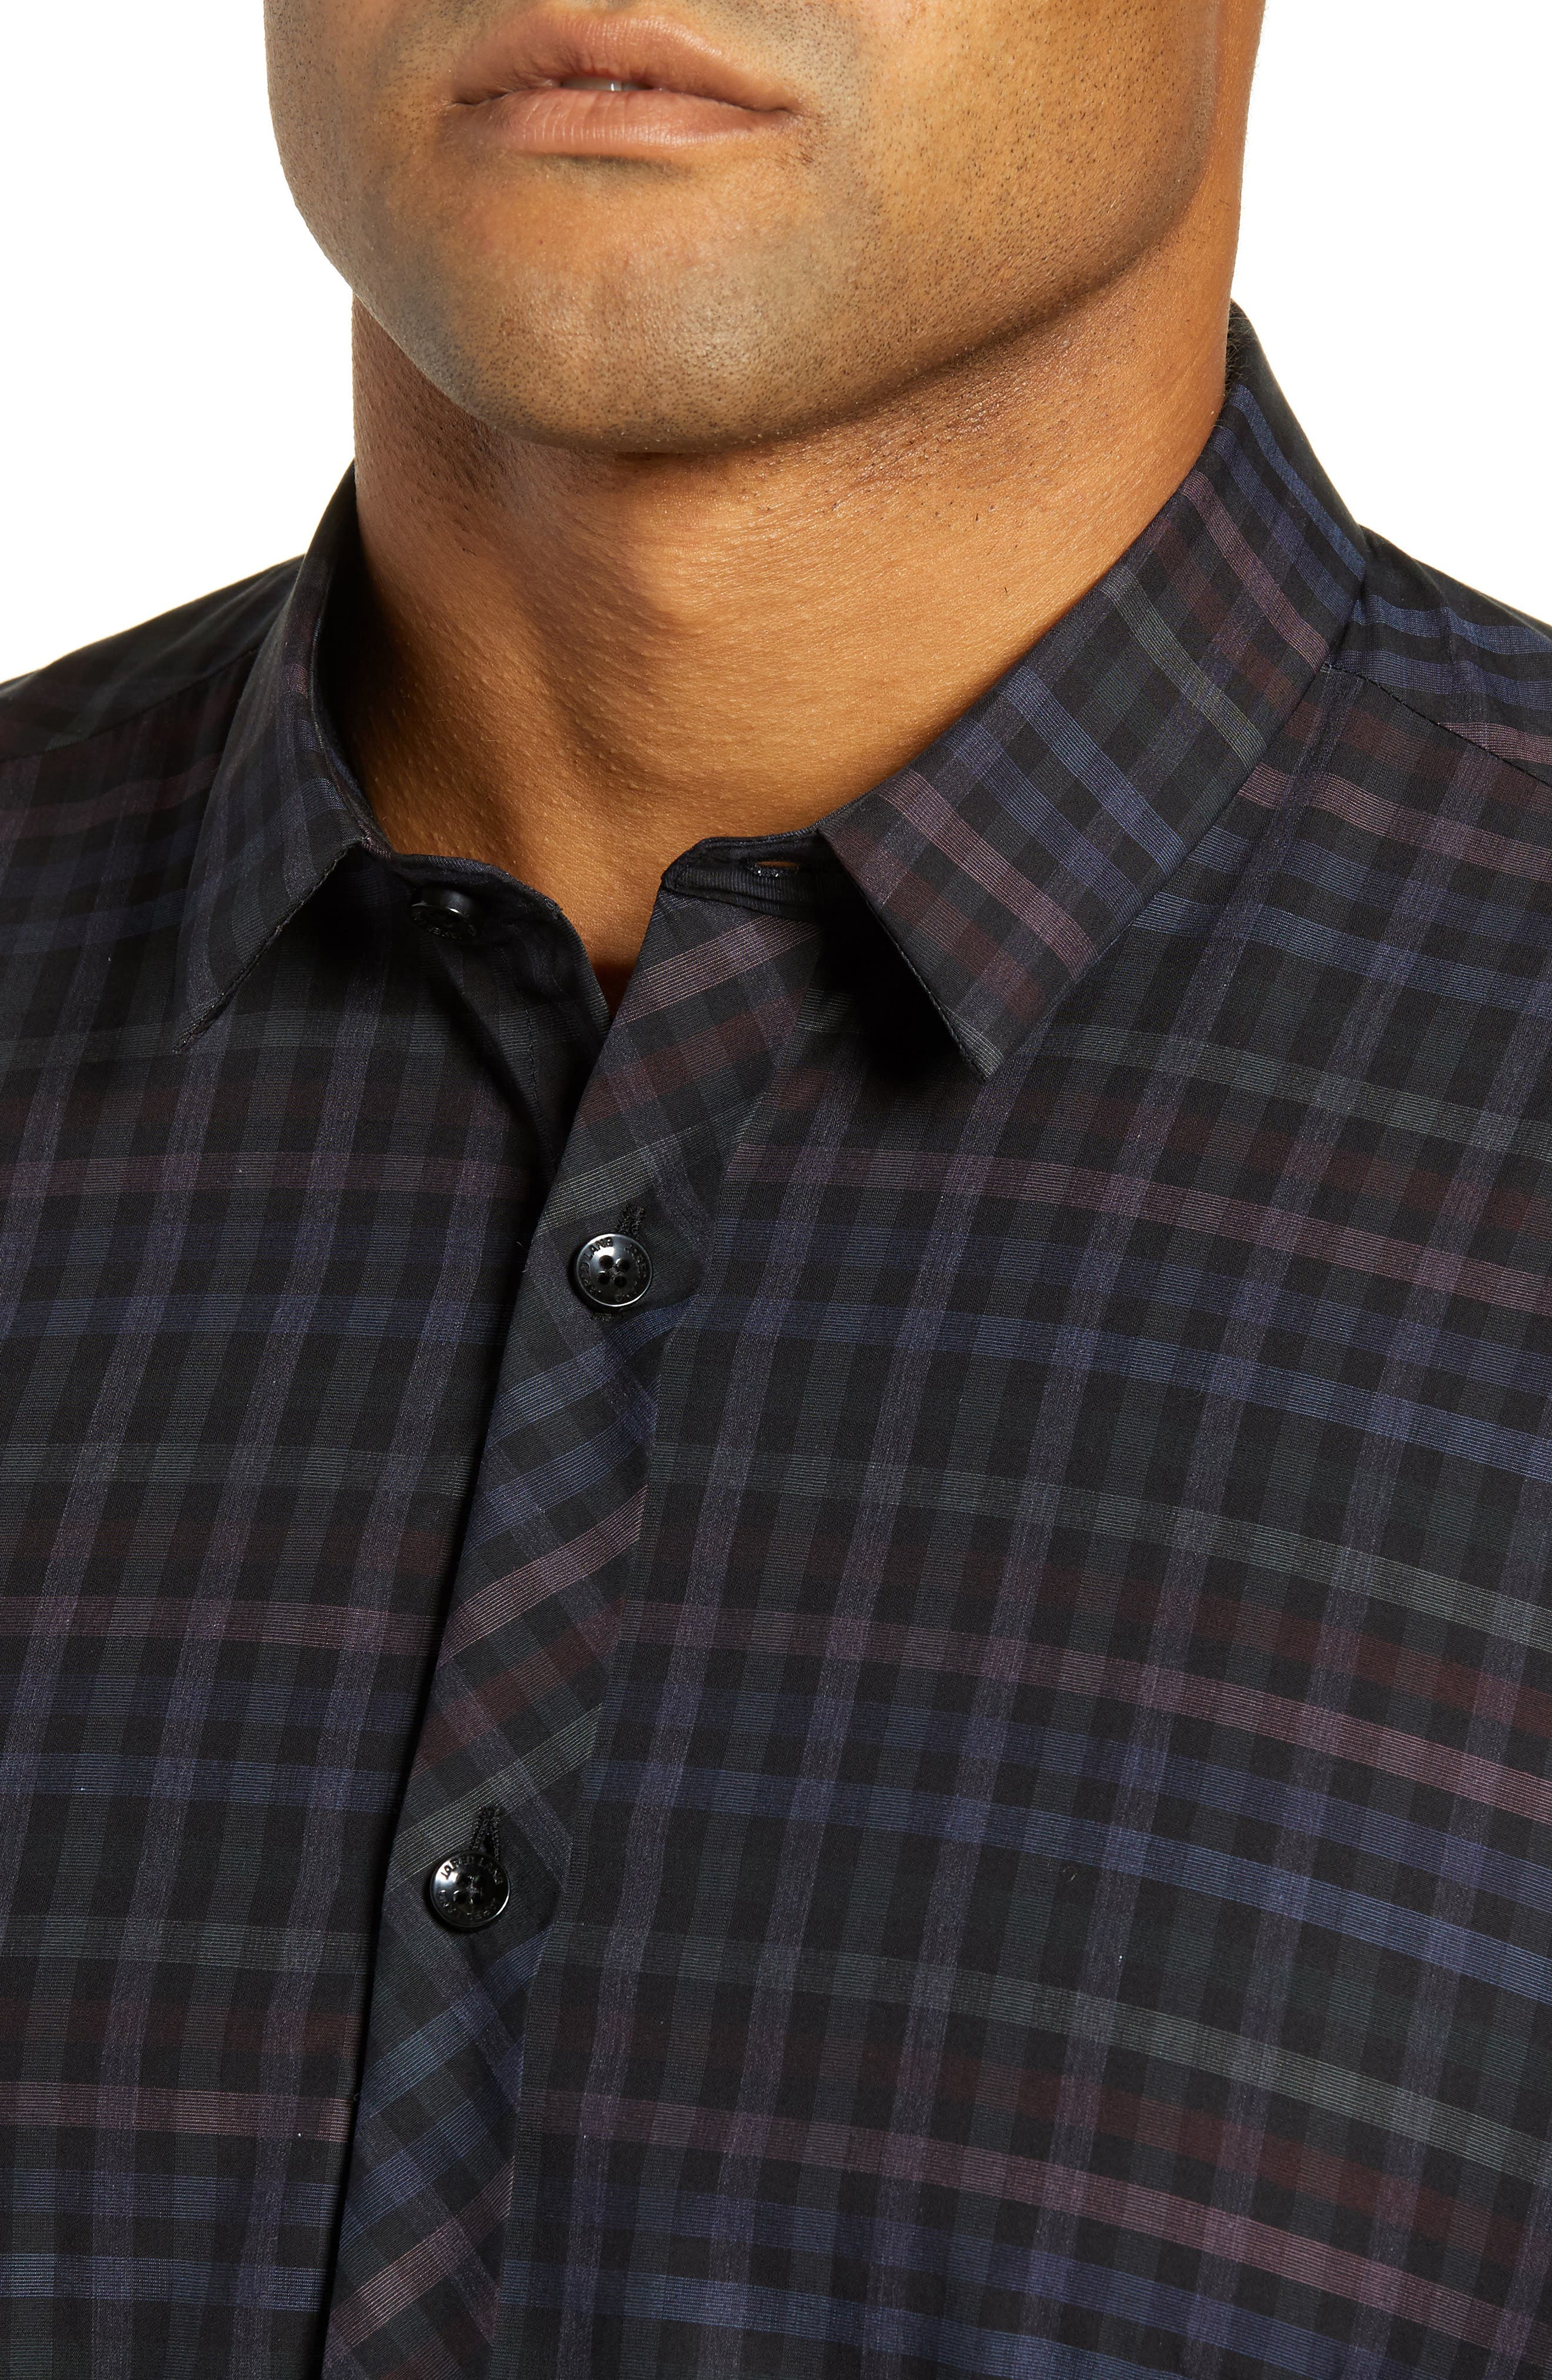 Trim Fit Sport Shirt,                             Alternate thumbnail 2, color,                             MULTI CHECK